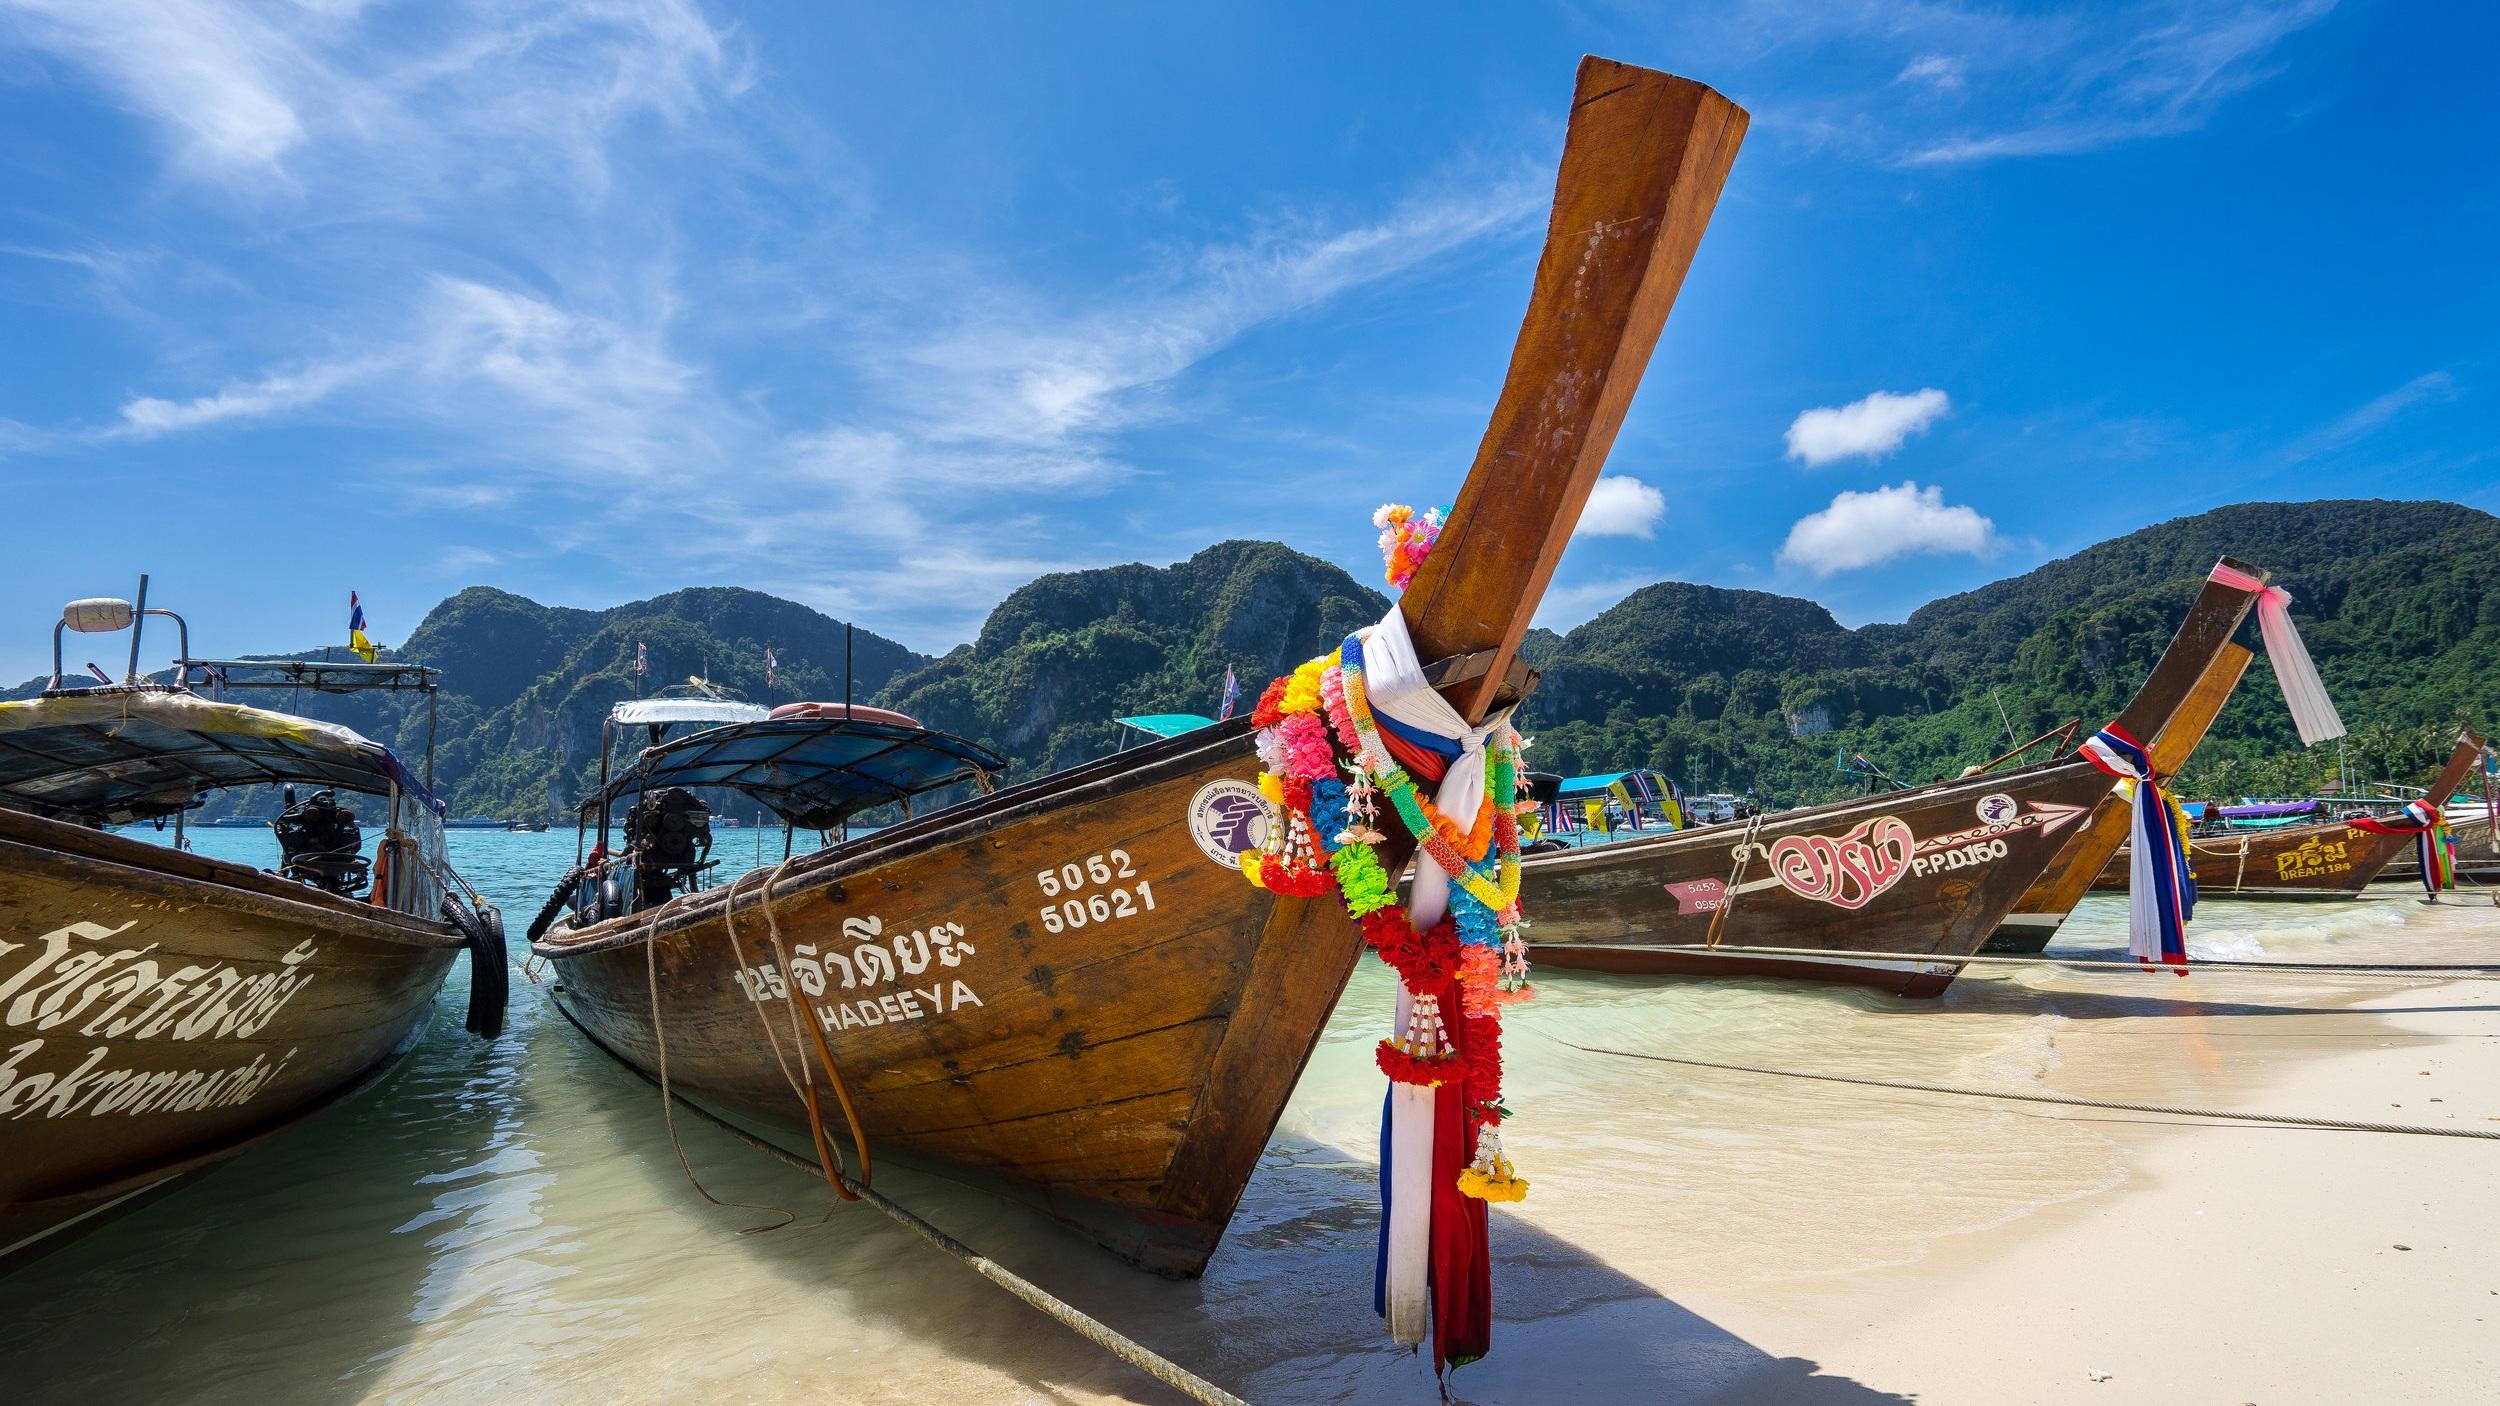 Tailandia - La meca del turismo del sudeste asiático